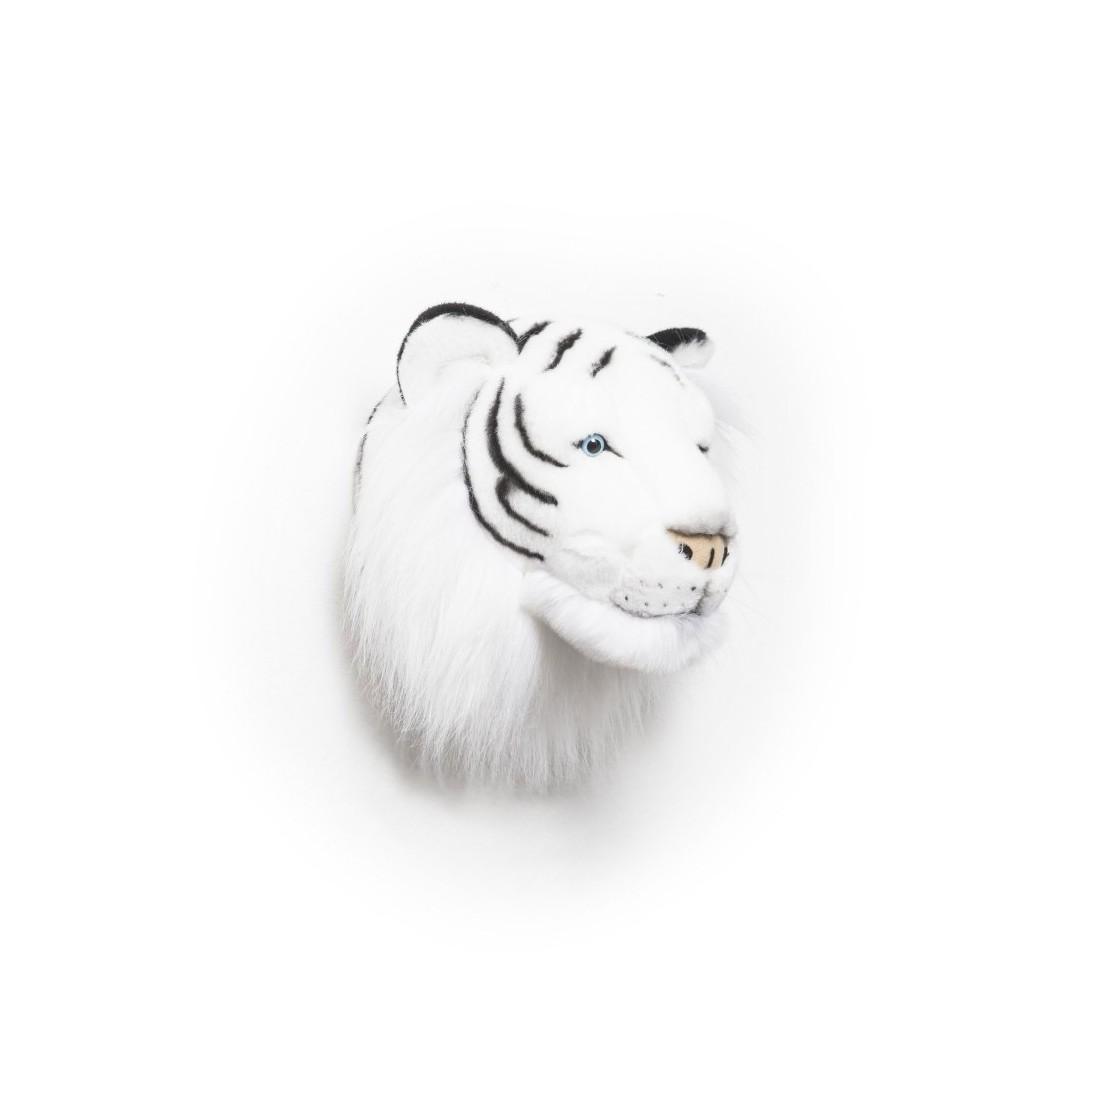 d co murale enfant peluche t te tigre blanc bibib ma chambramoi. Black Bedroom Furniture Sets. Home Design Ideas